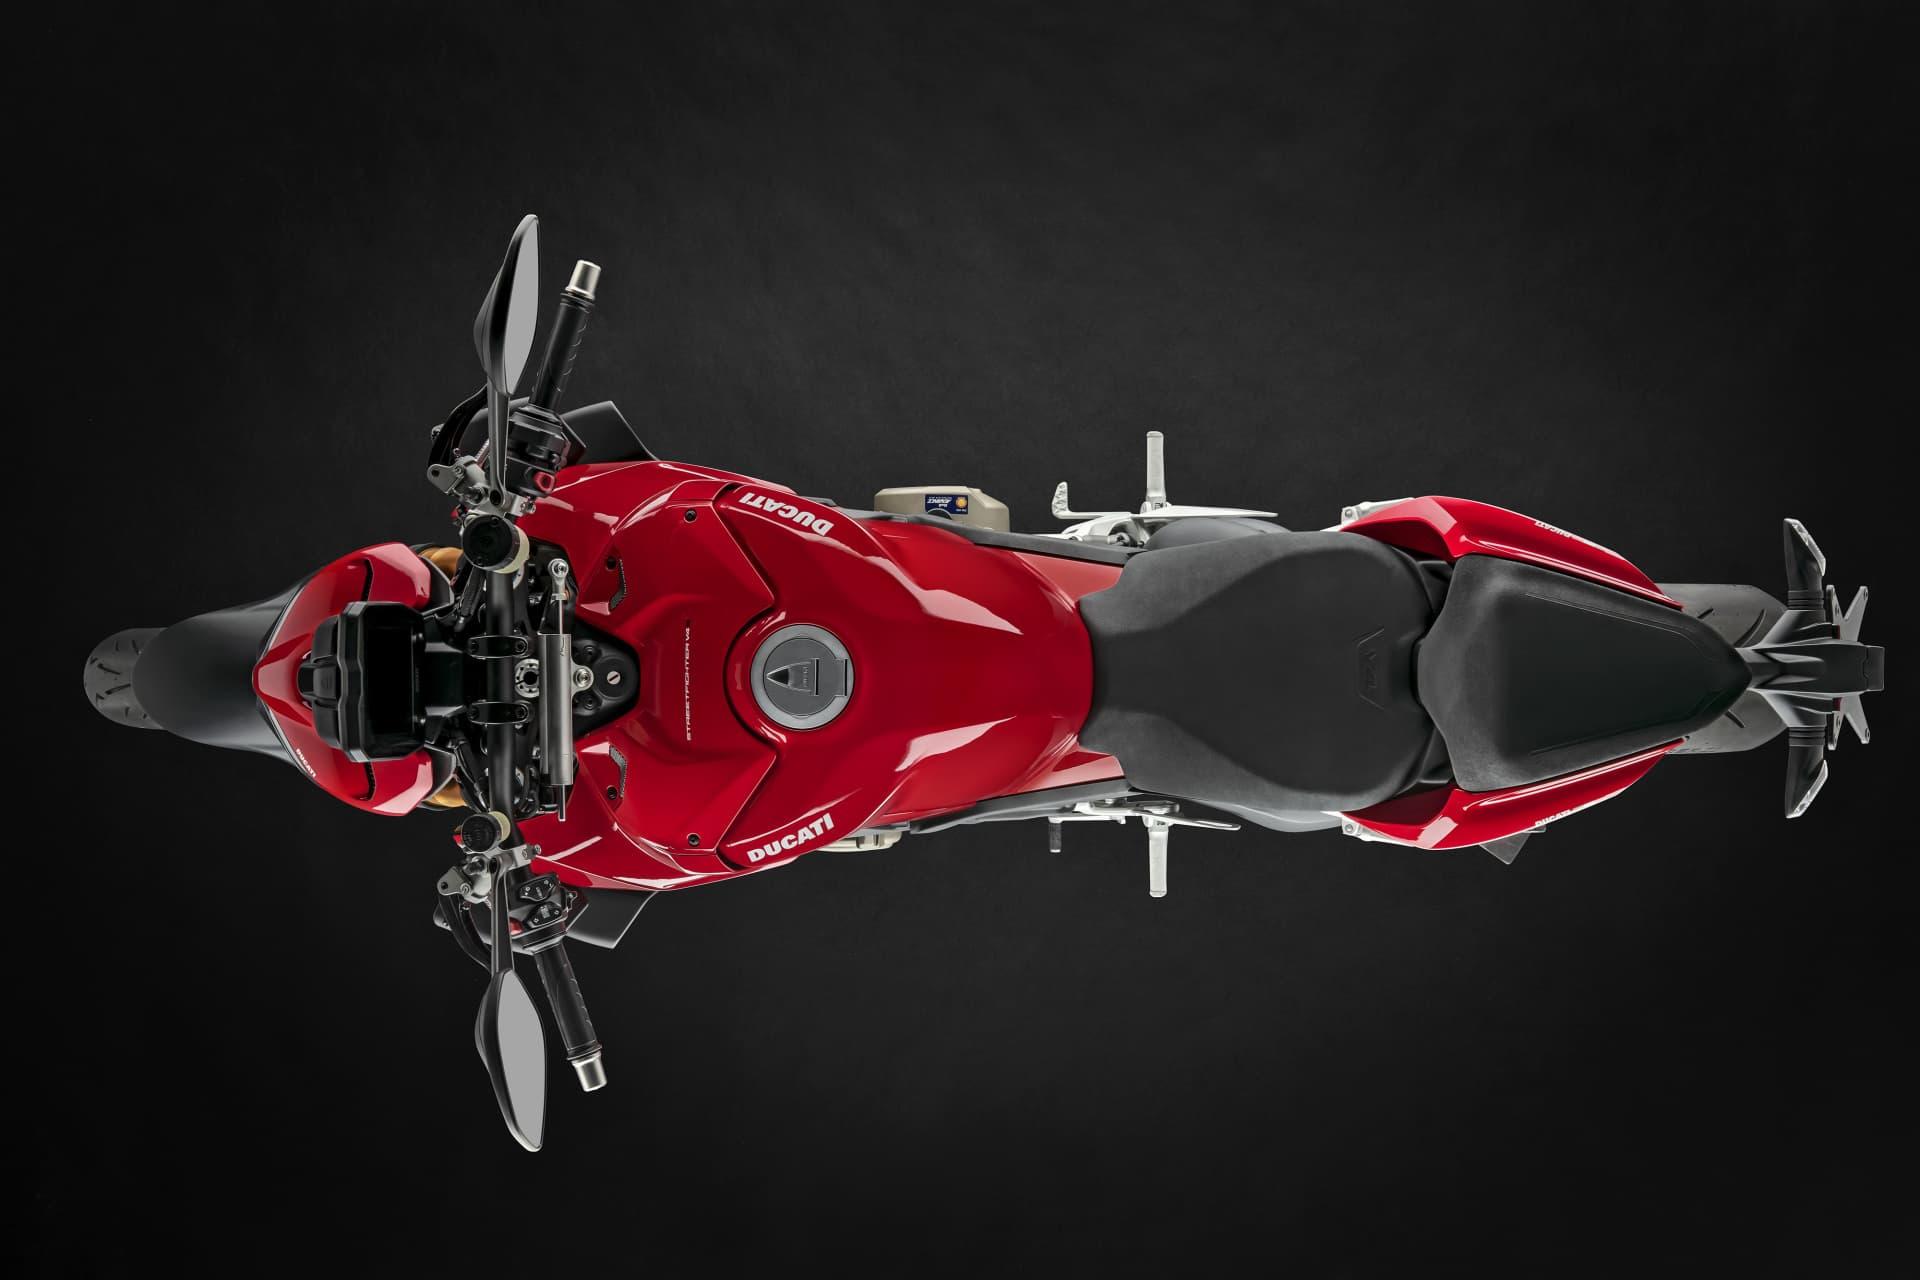 My20 Ducati Streetfigher V4 S 01 Uc101685 Mid